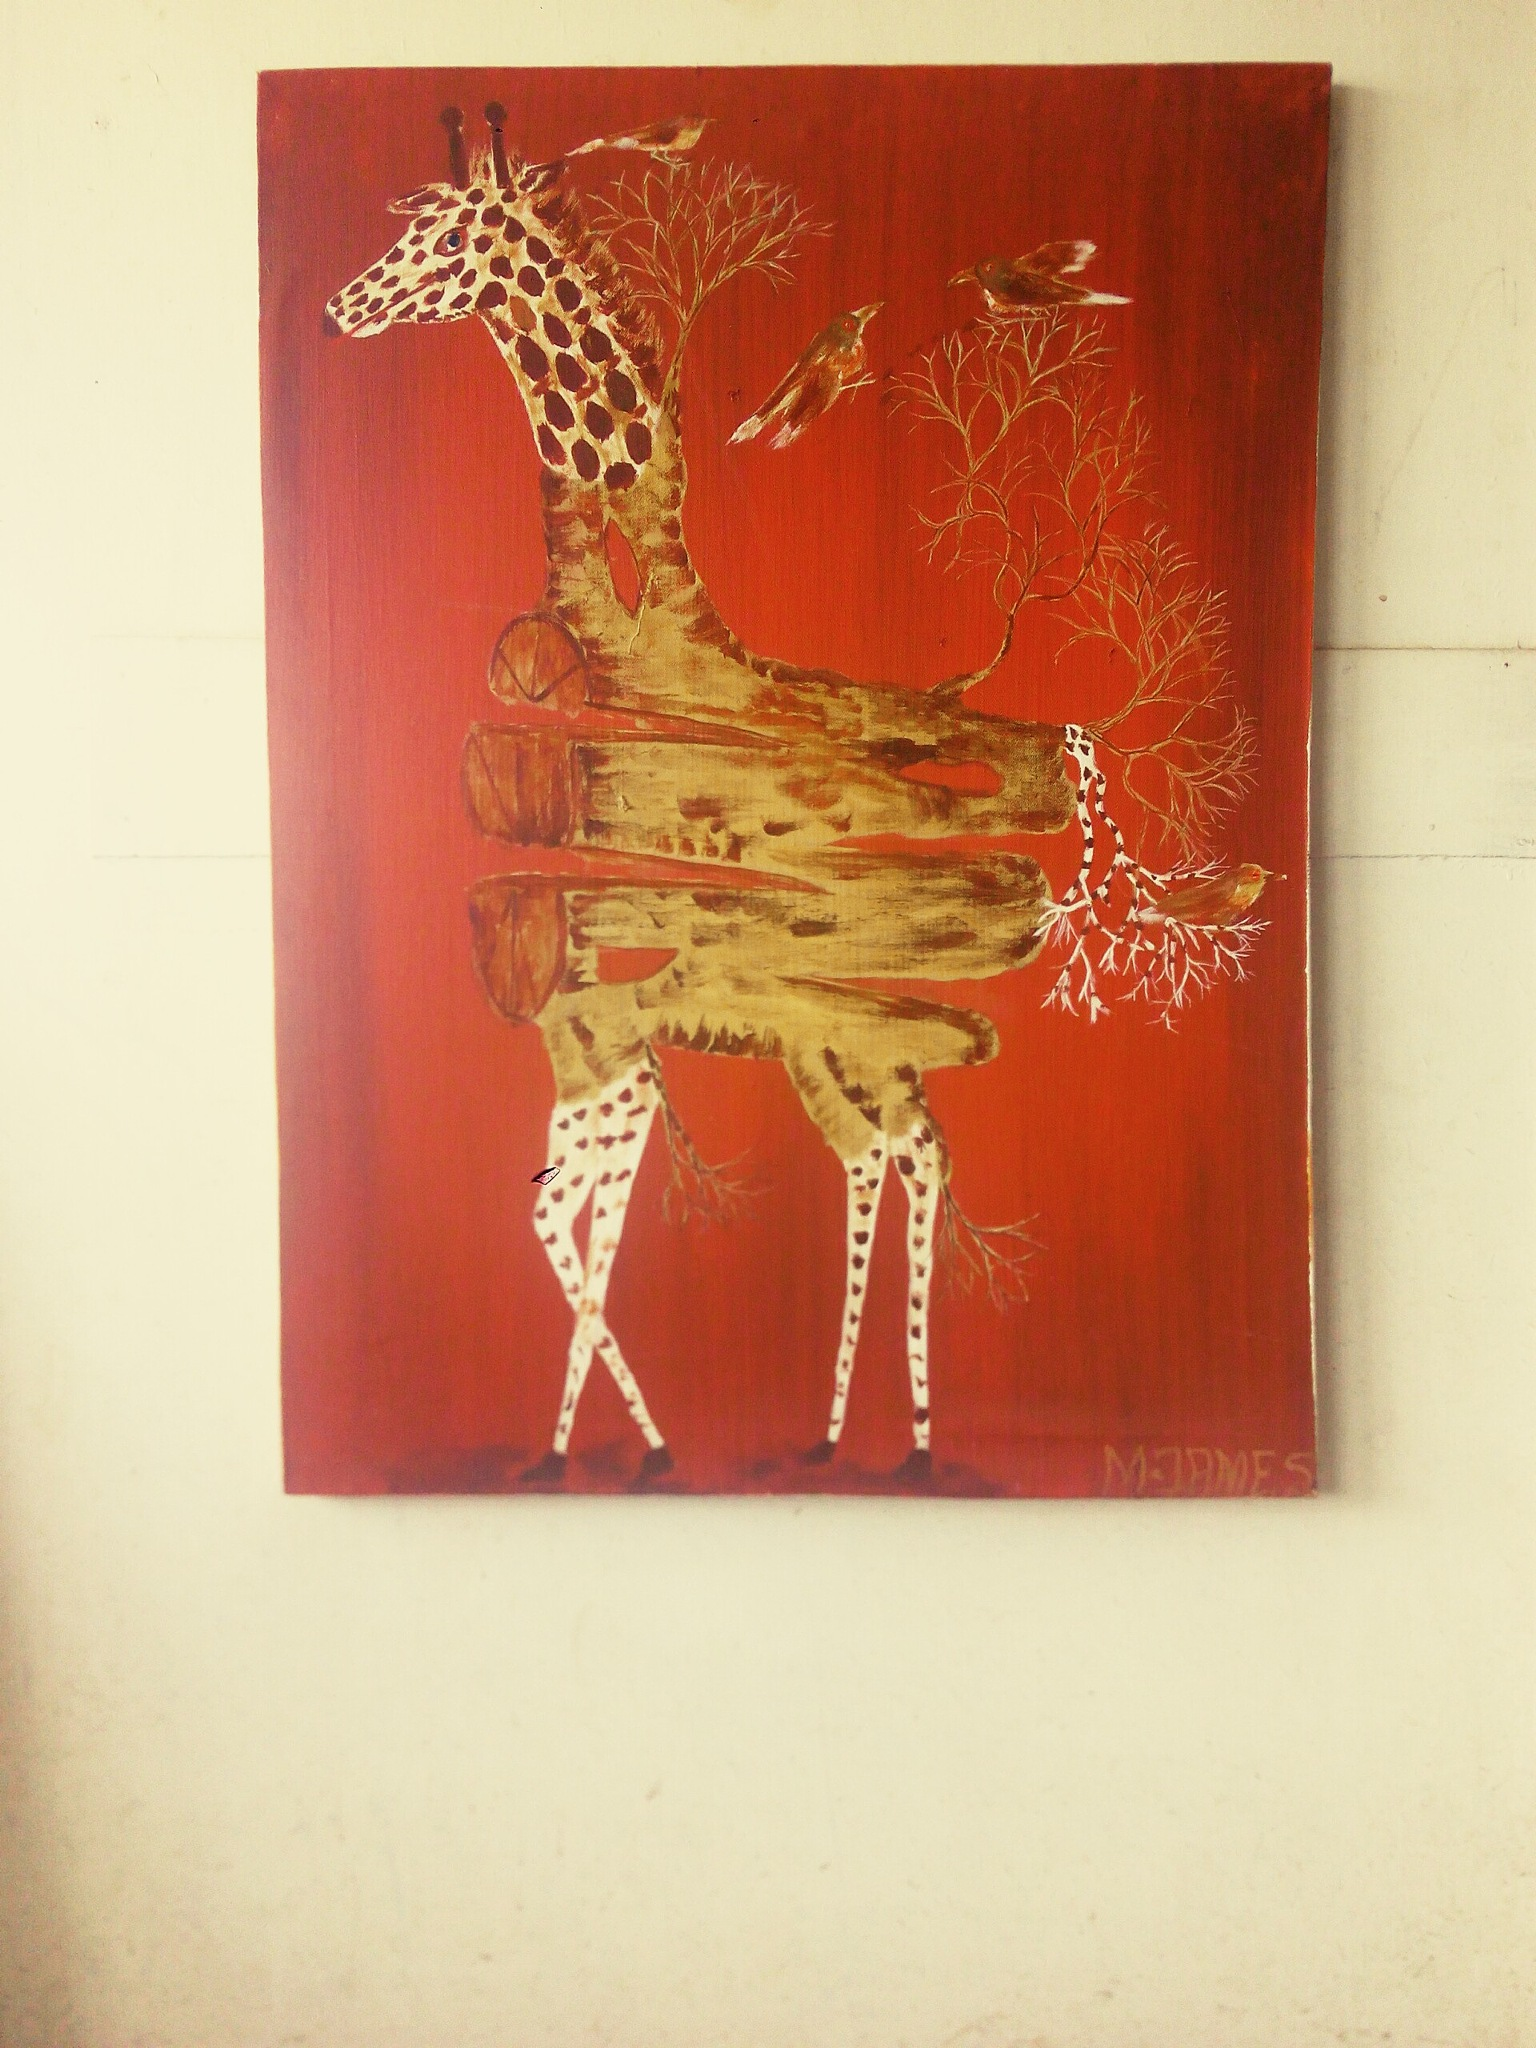 a giraffe by Kamaujames Mwaura